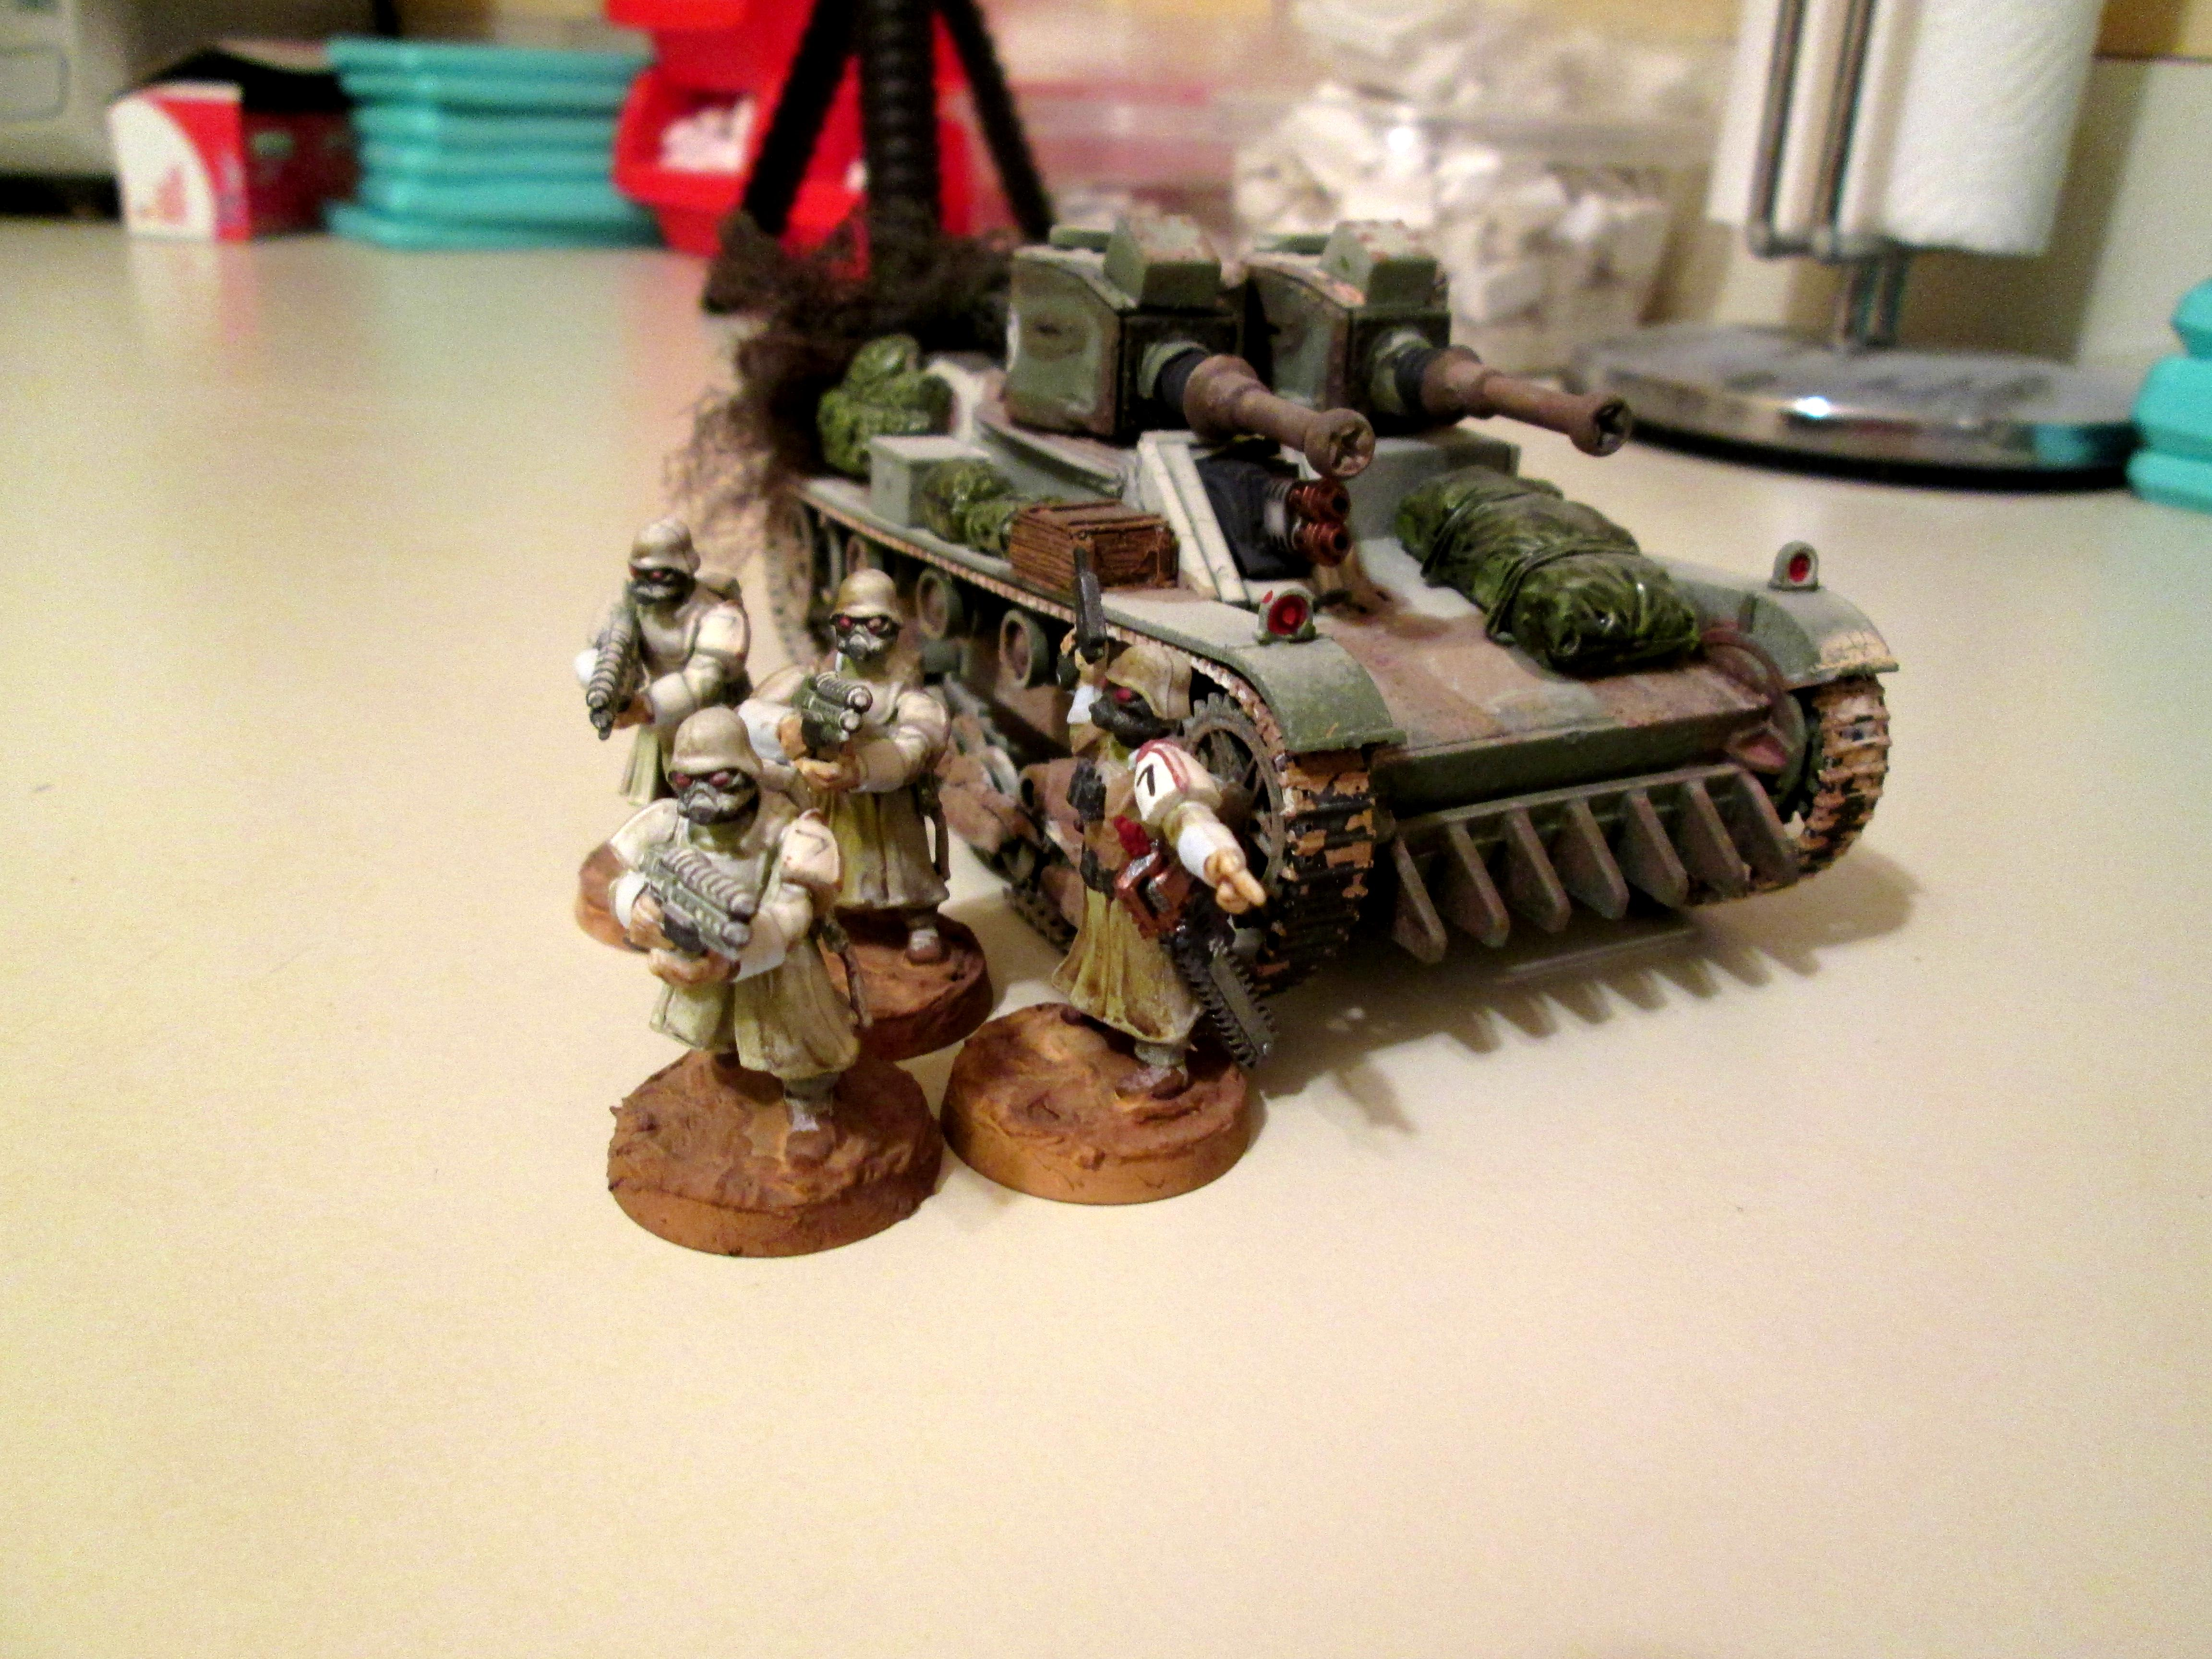 7tp, Conversion, Hellhound, Imperial Guard